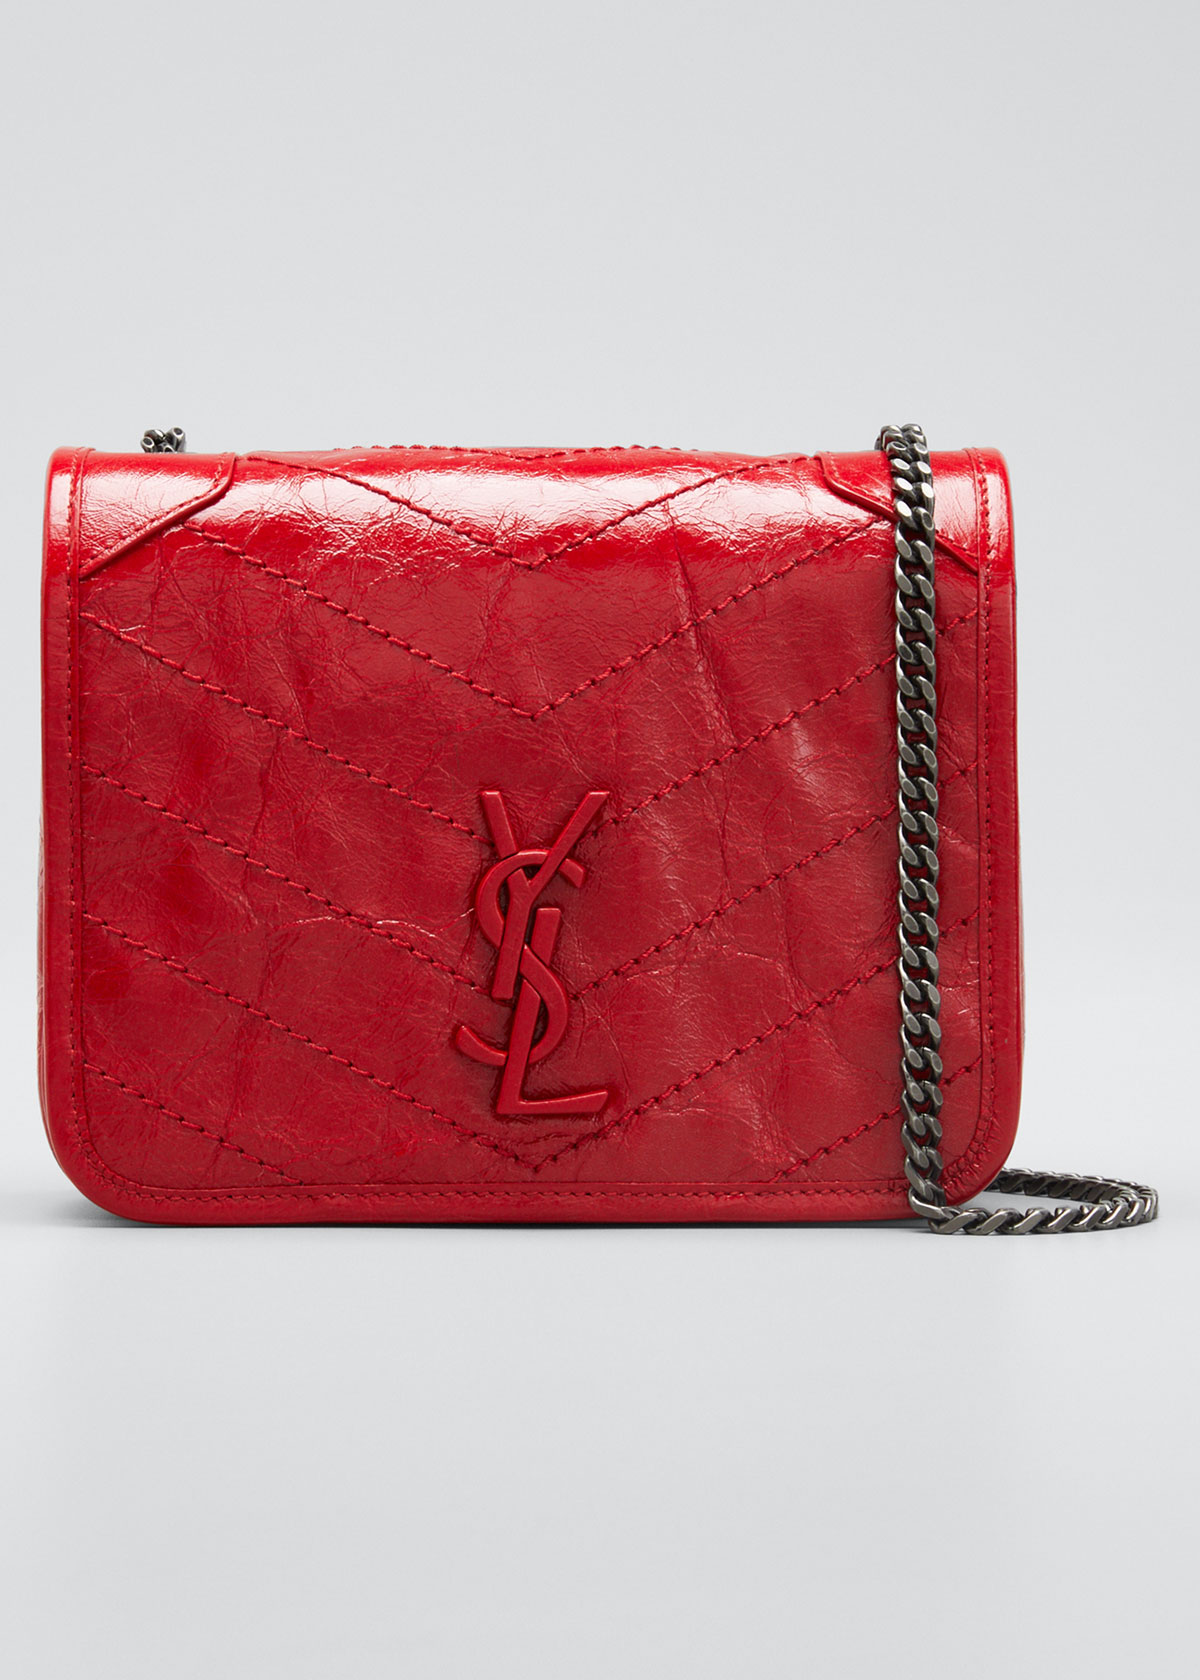 Niki Ys Monogram Leather Wallet On Chain by Saint Laurent